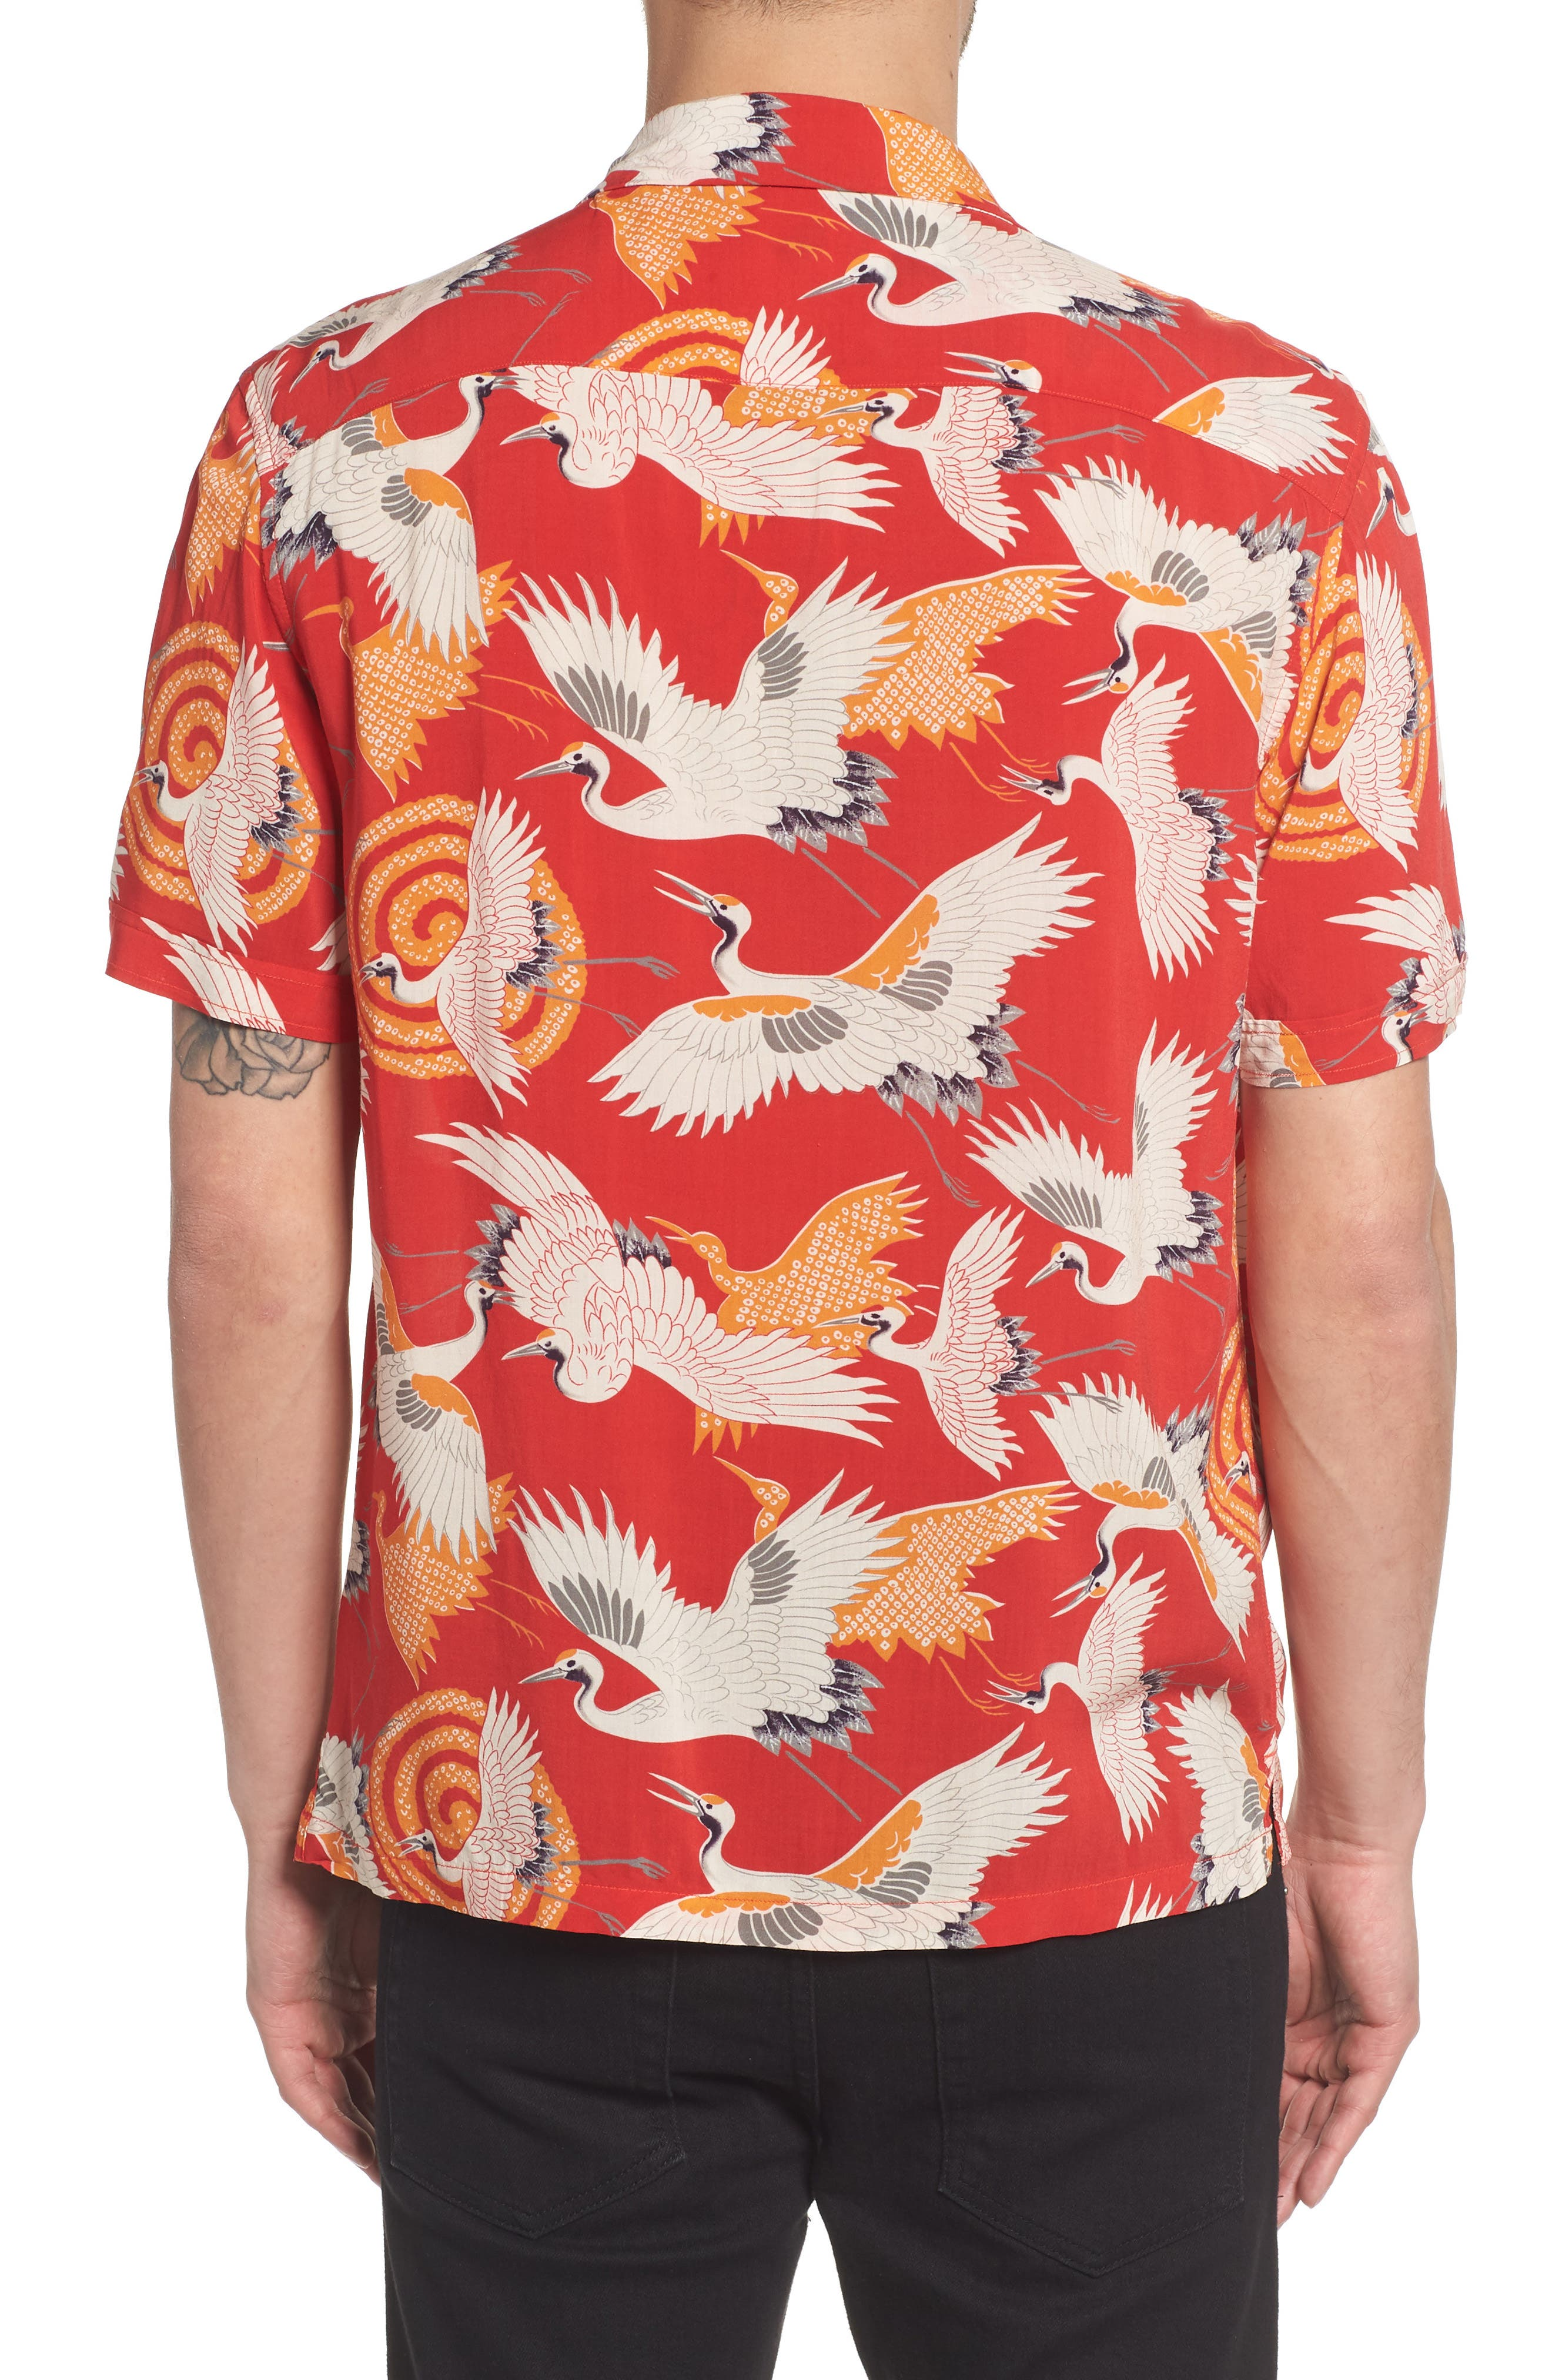 Tsuru Regular Fit Short Sleeve Sport Shirt,                             Alternate thumbnail 2, color,                             600